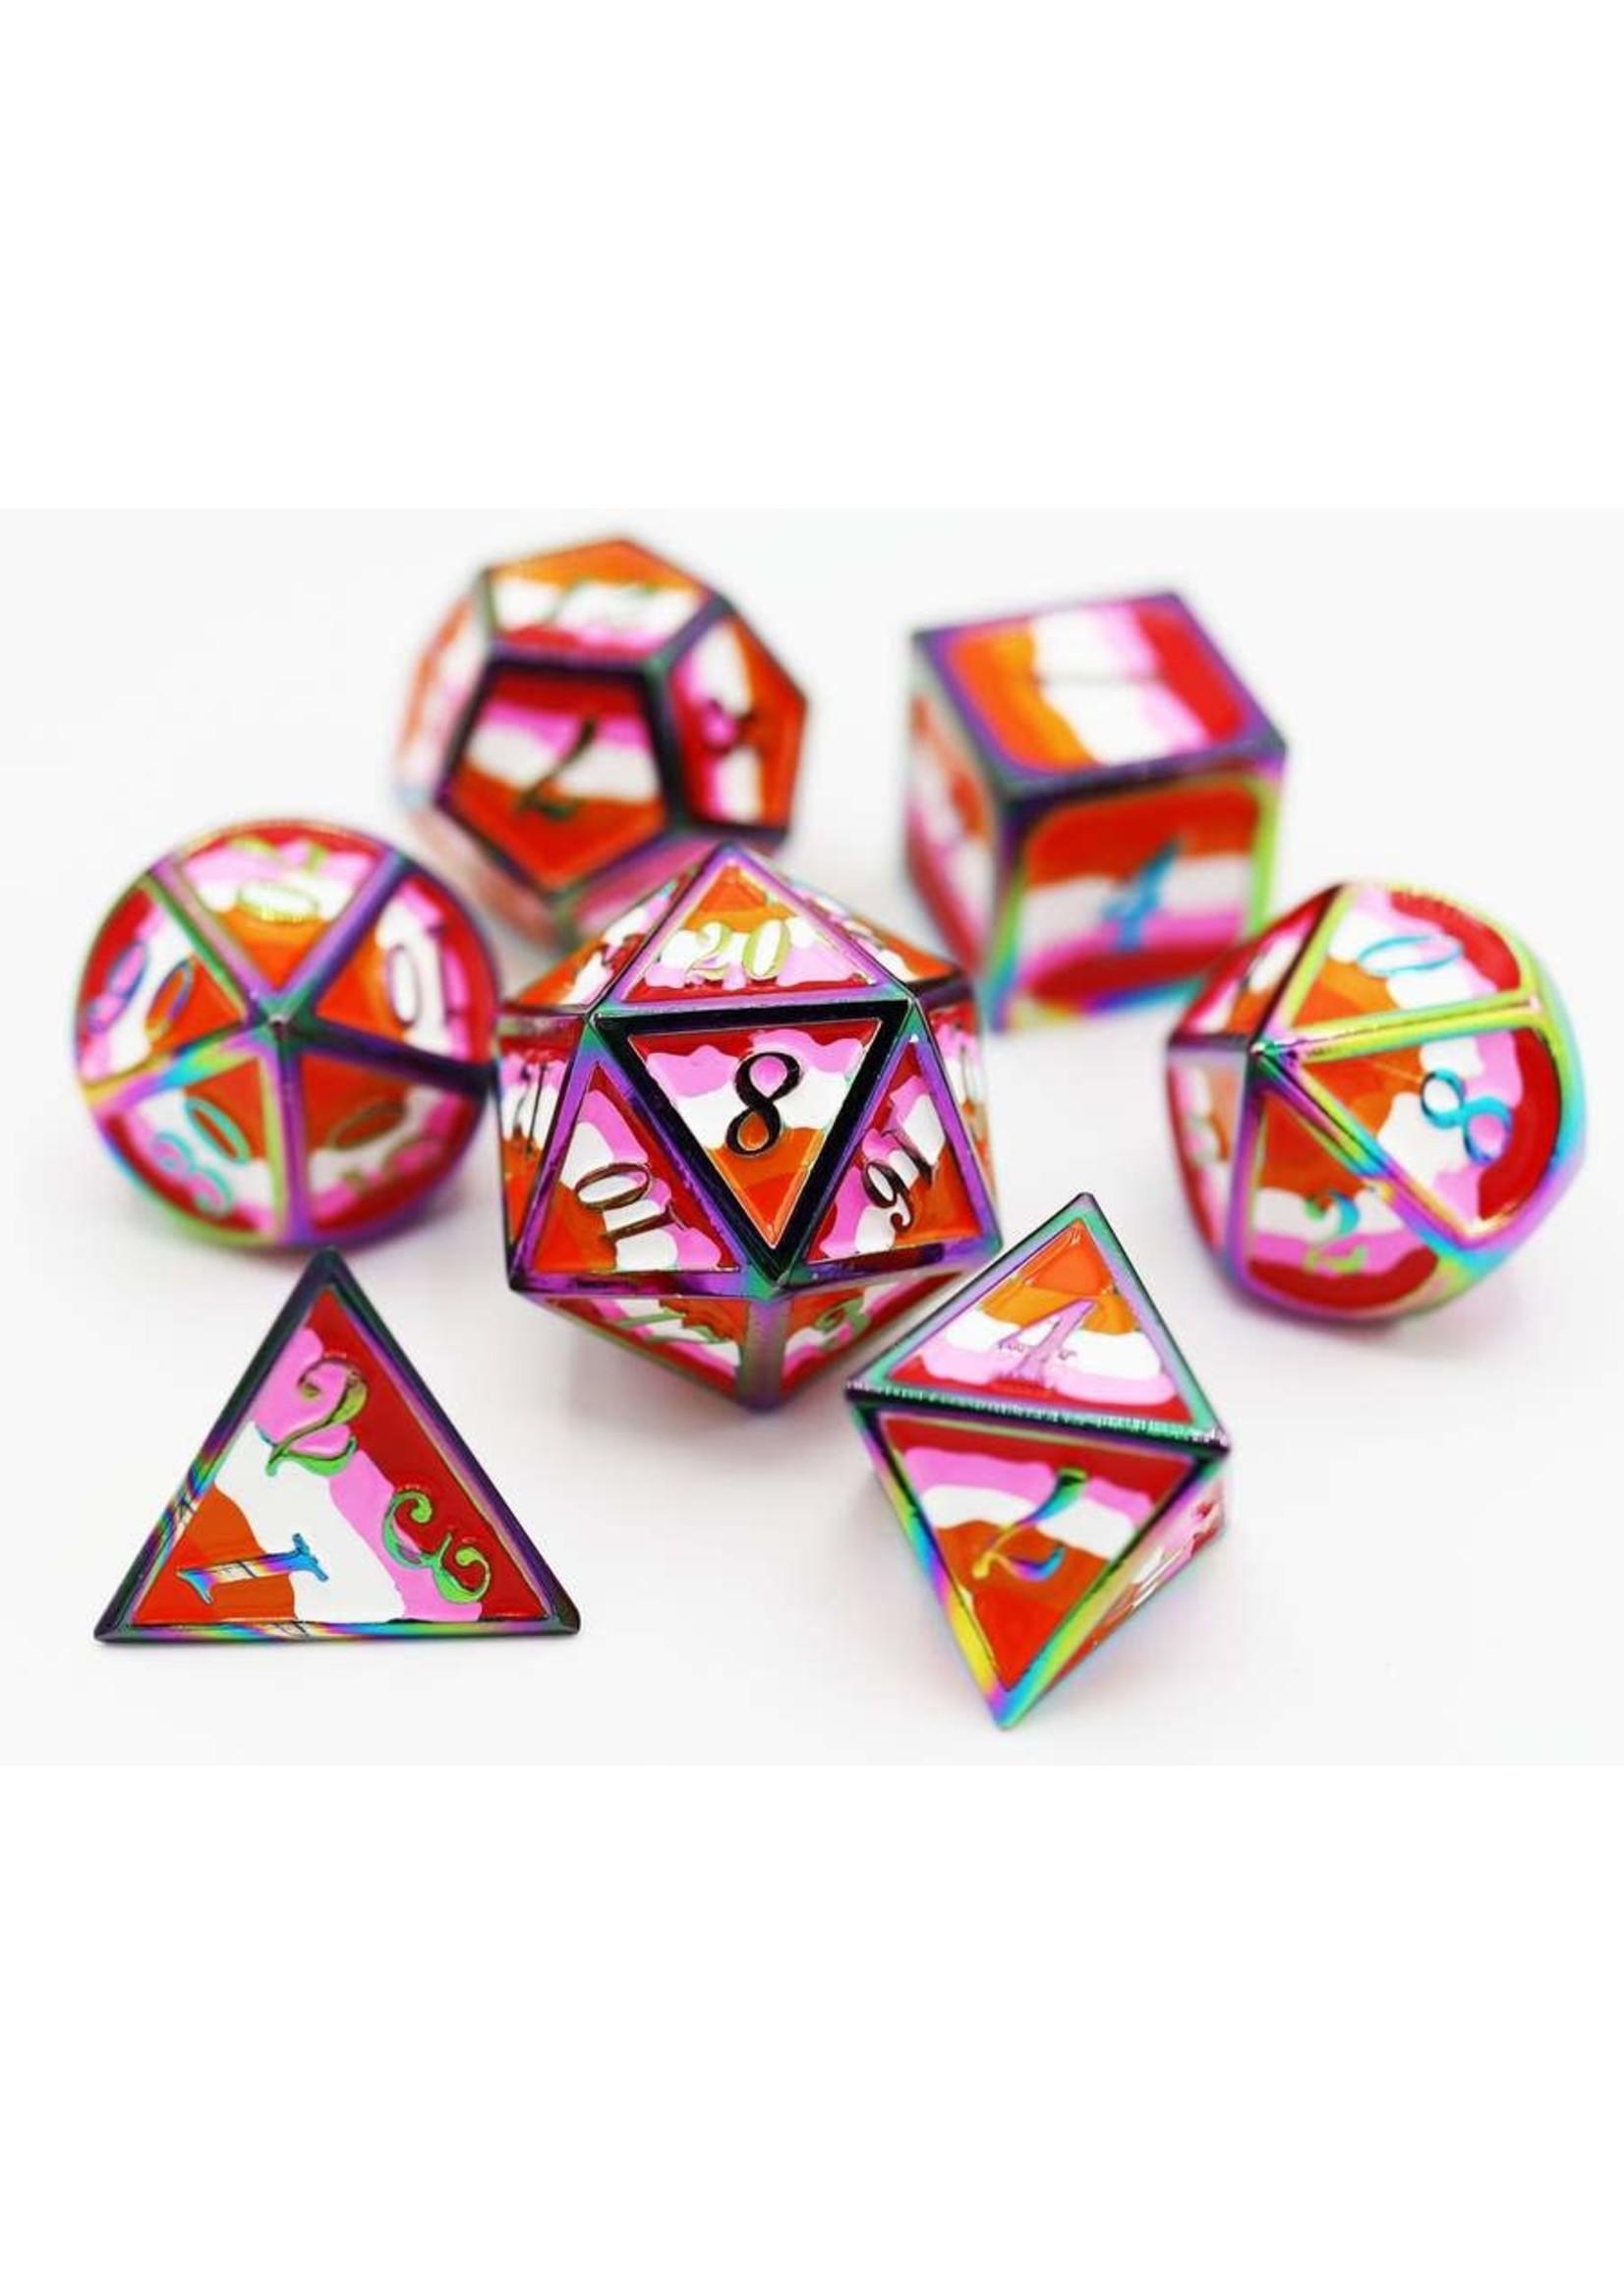 Foam Brain 16mm polyhedral 7 set metal - Pride Flag Lesbian